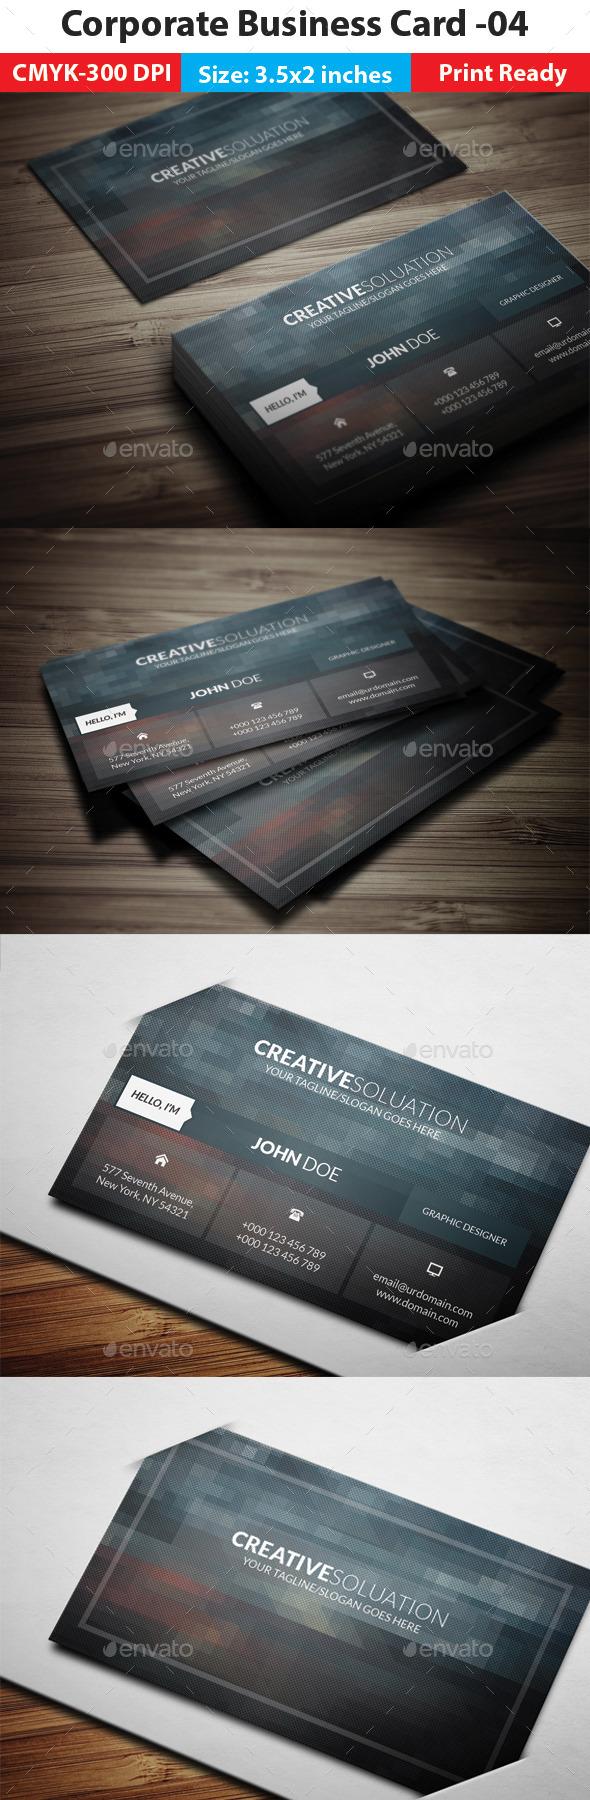 Corporate Business Card -04 - Corporate Business Cards